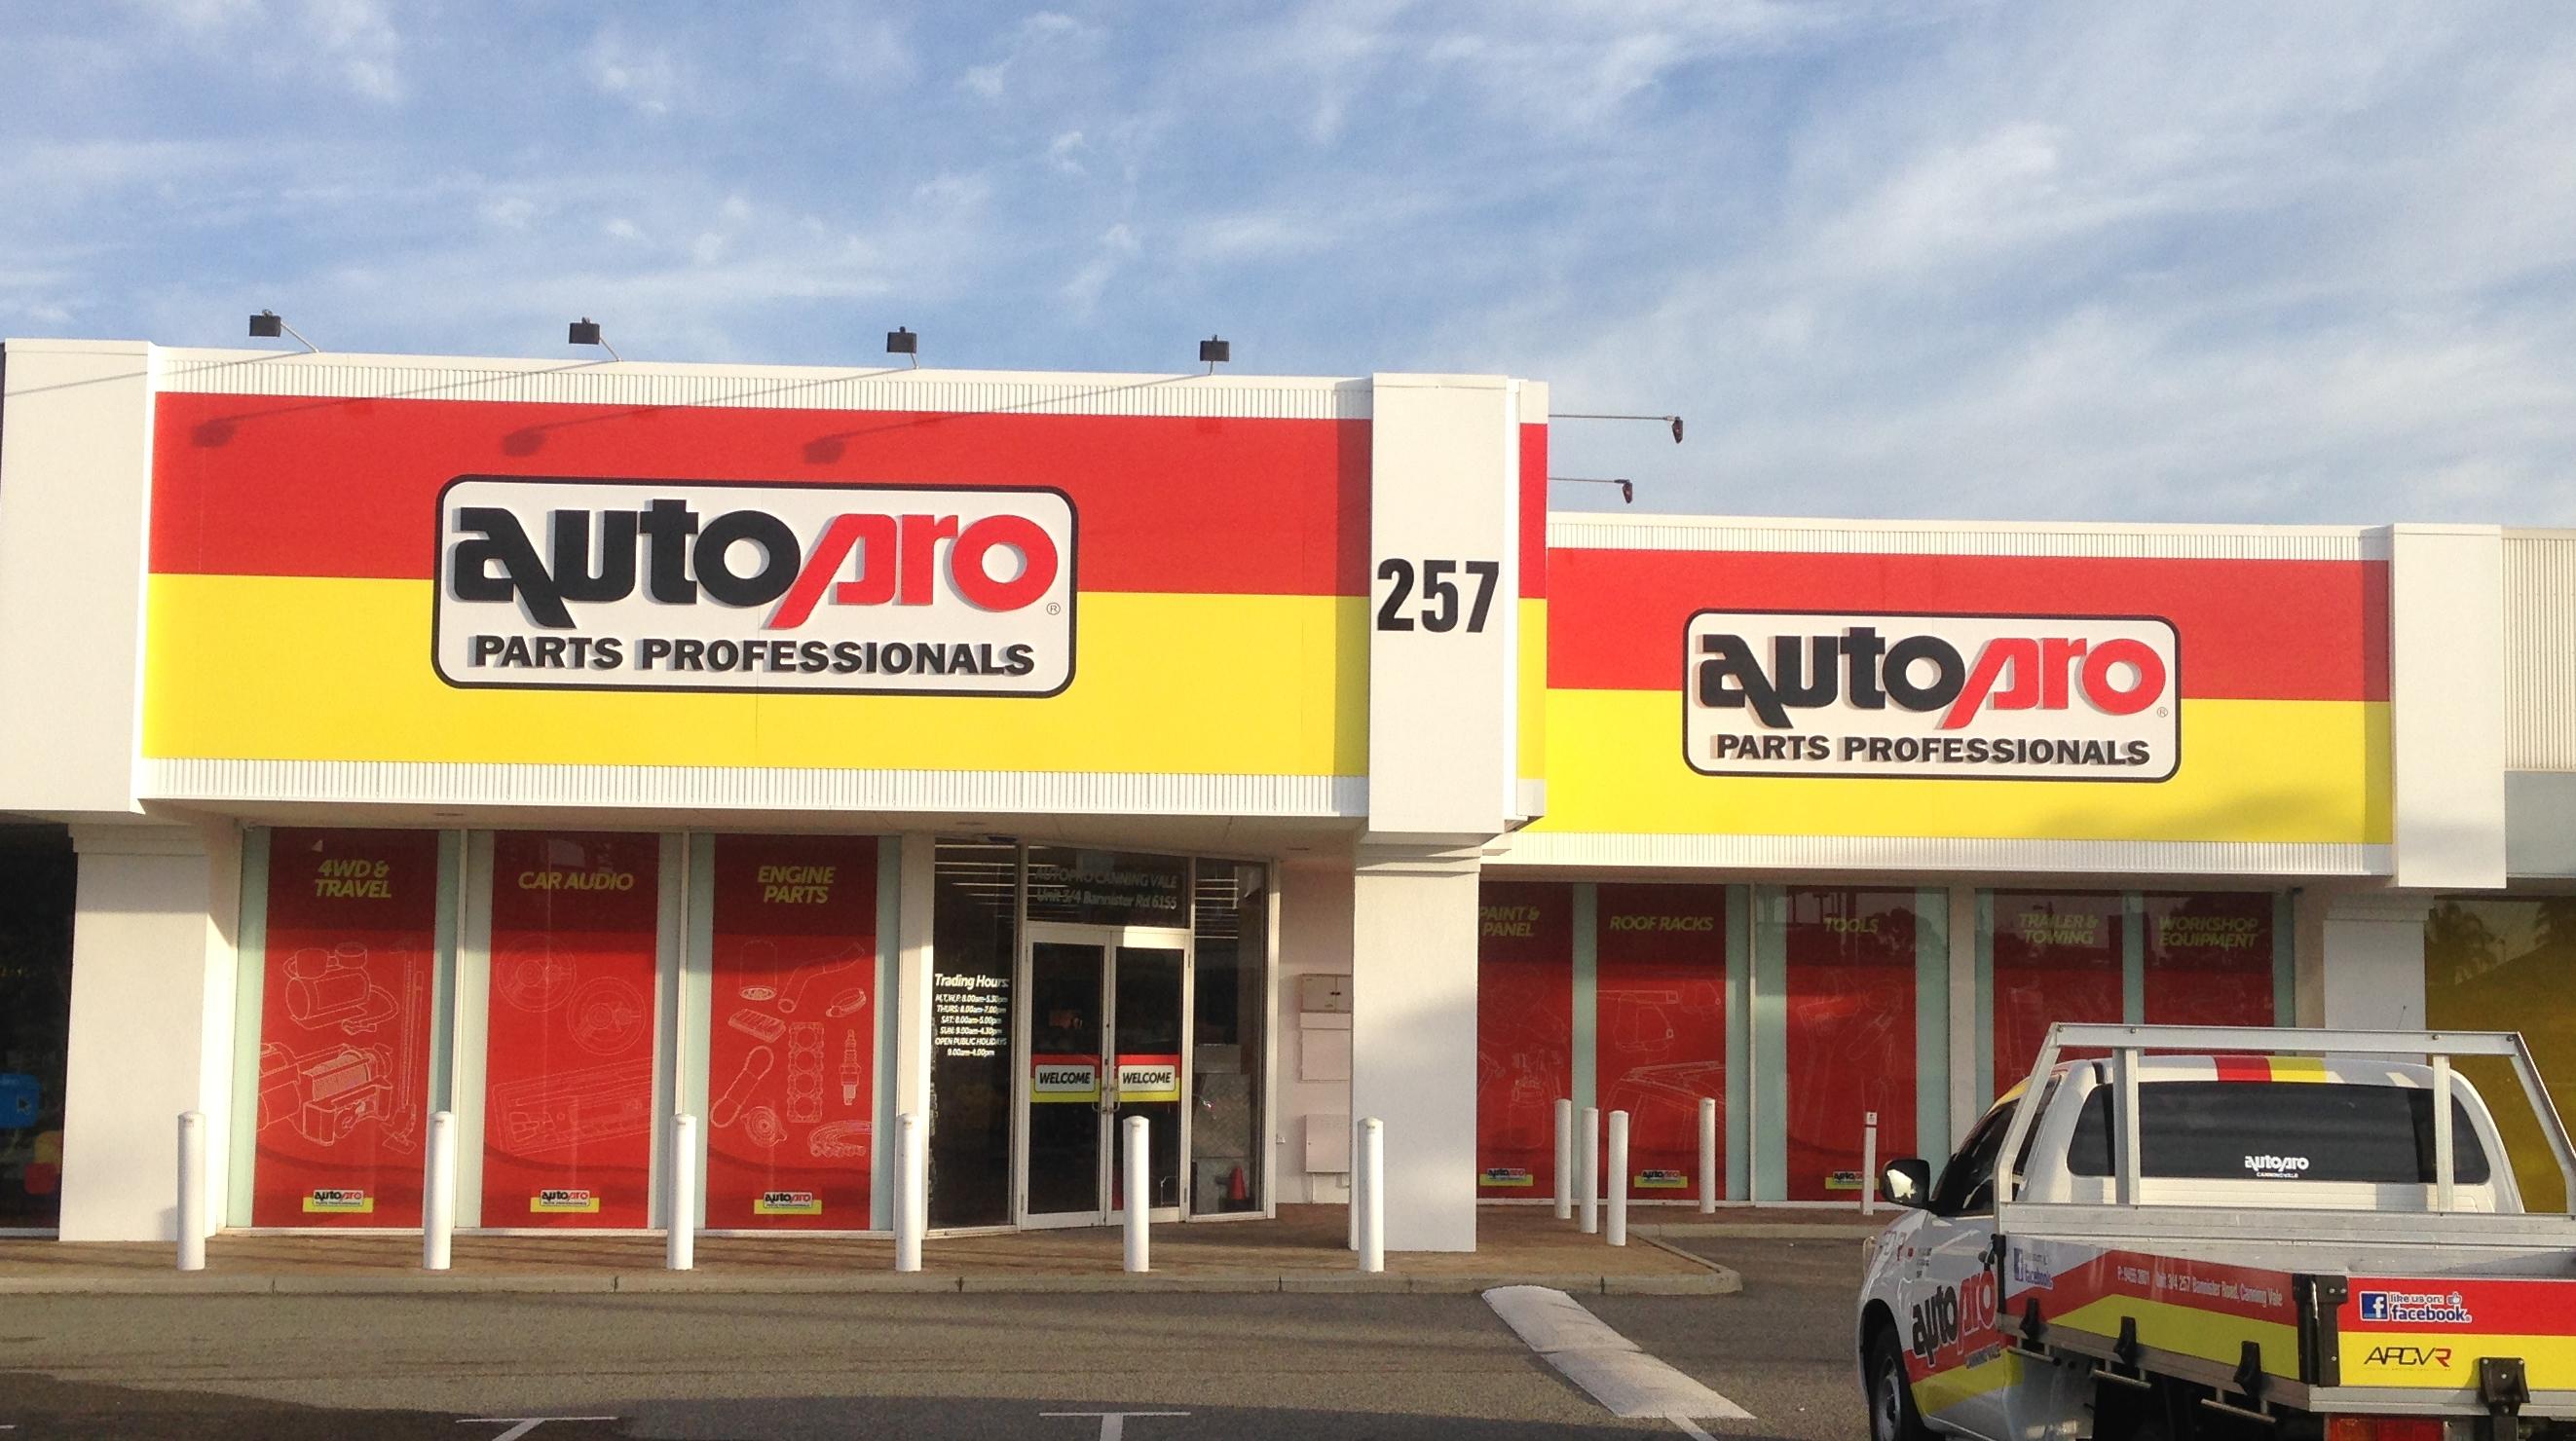 Autopro -Geraldton - Seeking New Franchisee